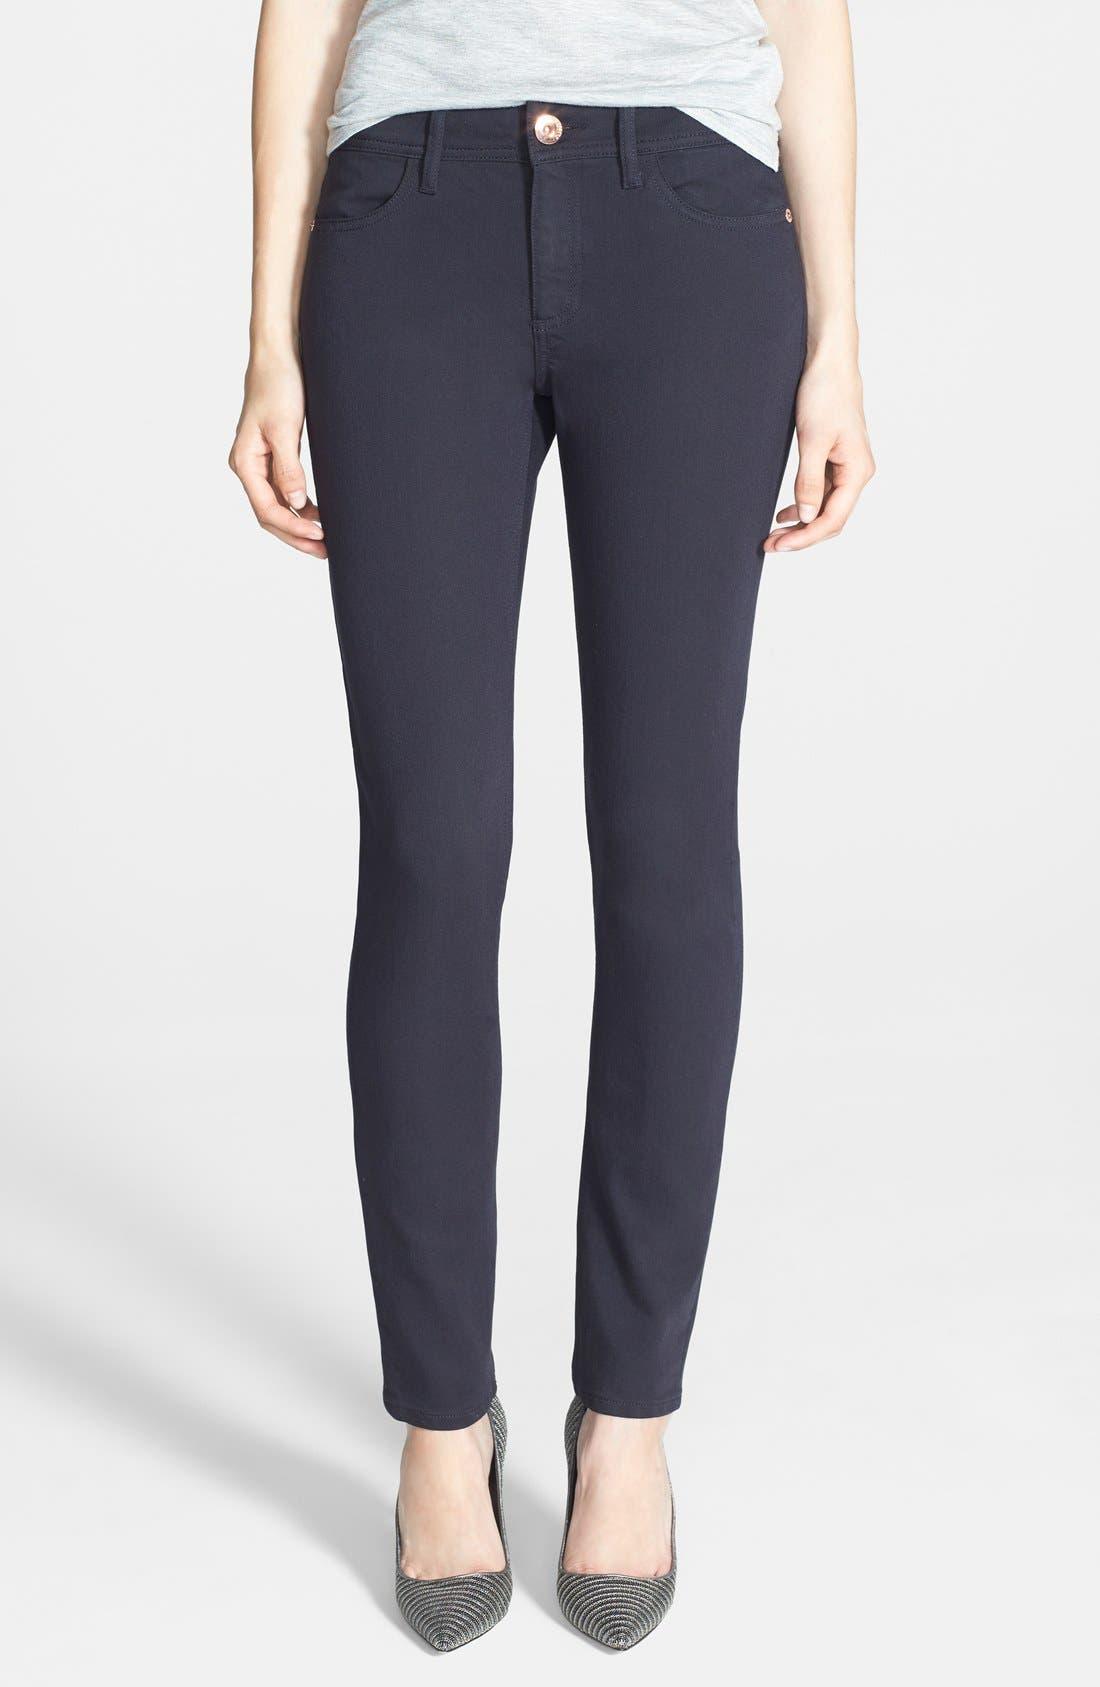 Alternate Image 1 Selected - DL1961 'Florence' Instasculpt Skinny Jeans (Fairview)